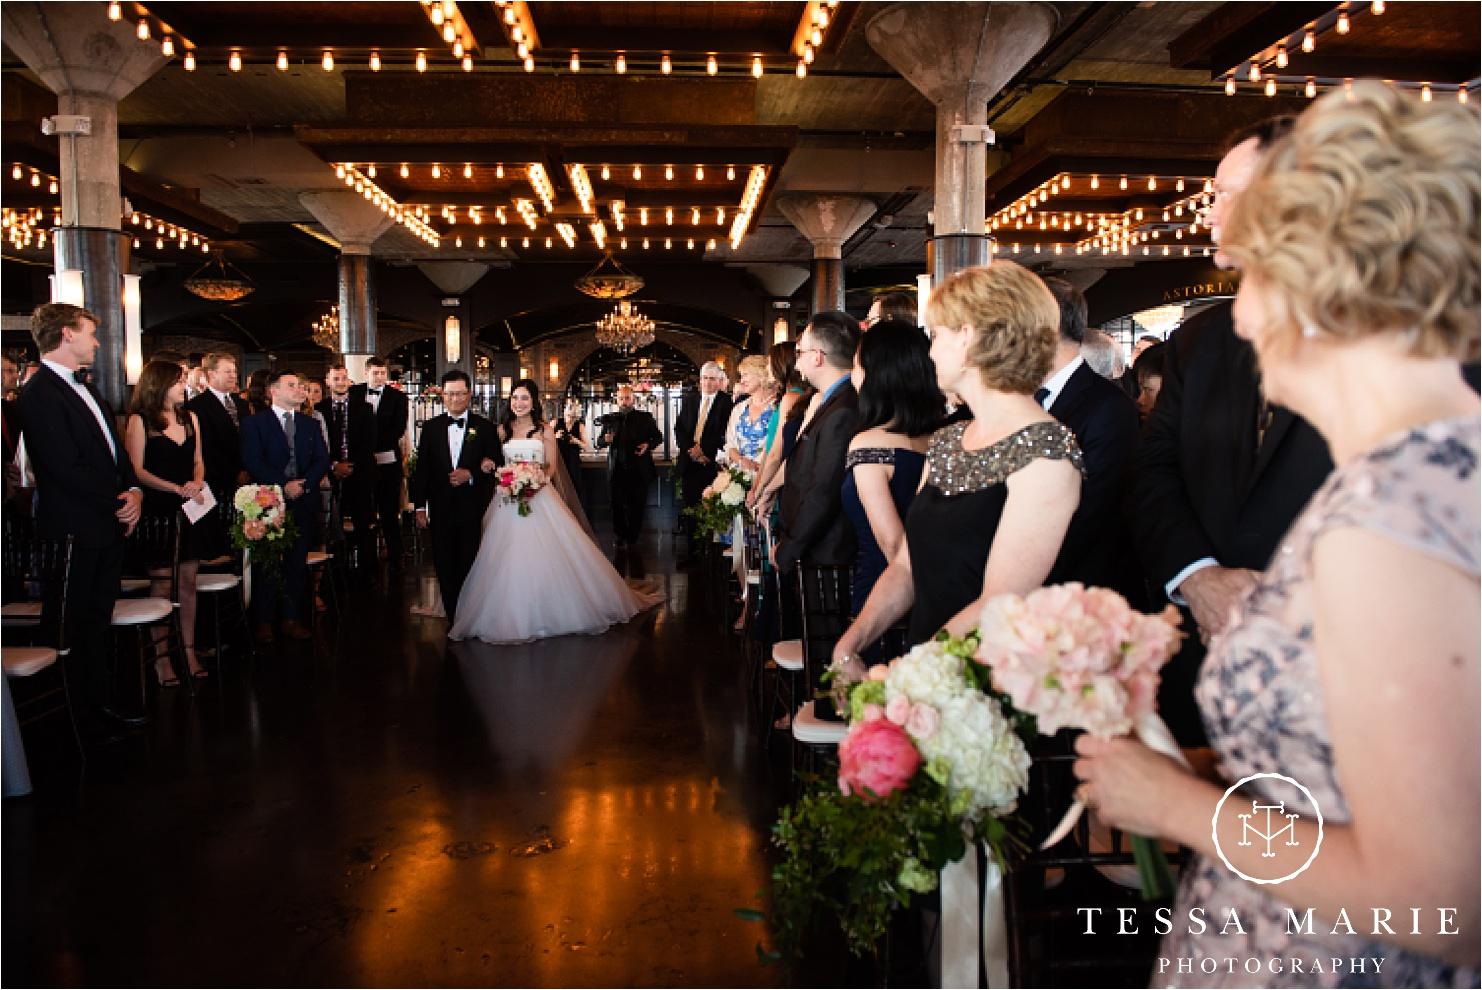 Tessa_marie_weddings_houston_wedding_photographer_The_astorian_0111.jpg